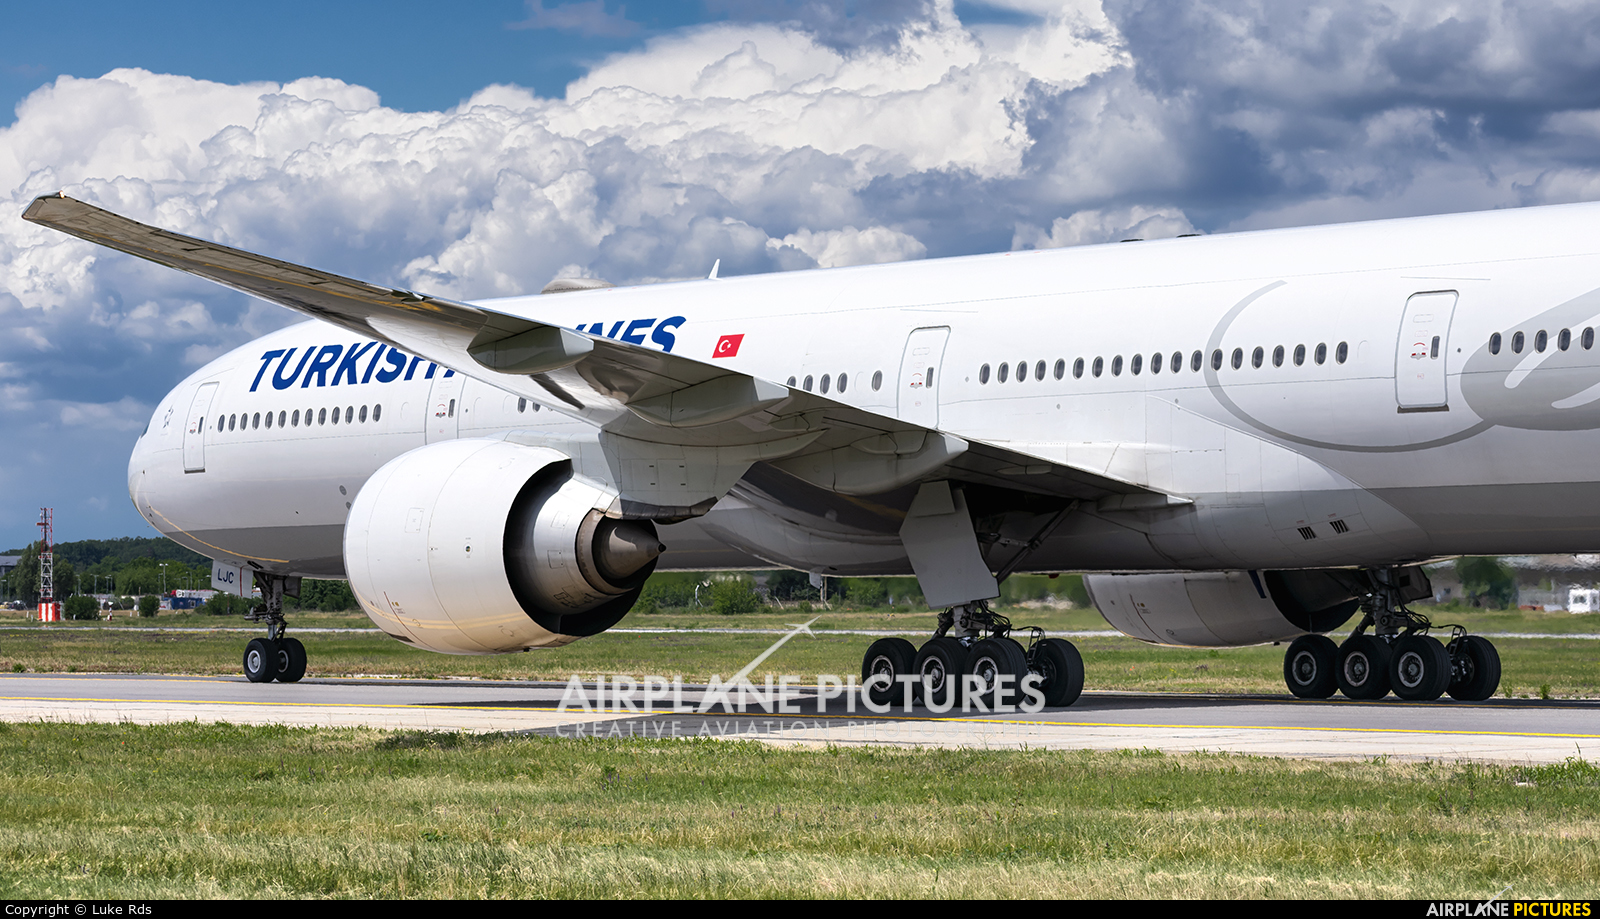 Turkish Airlines TC-LJC aircraft at Bucharest - Henri Coandă